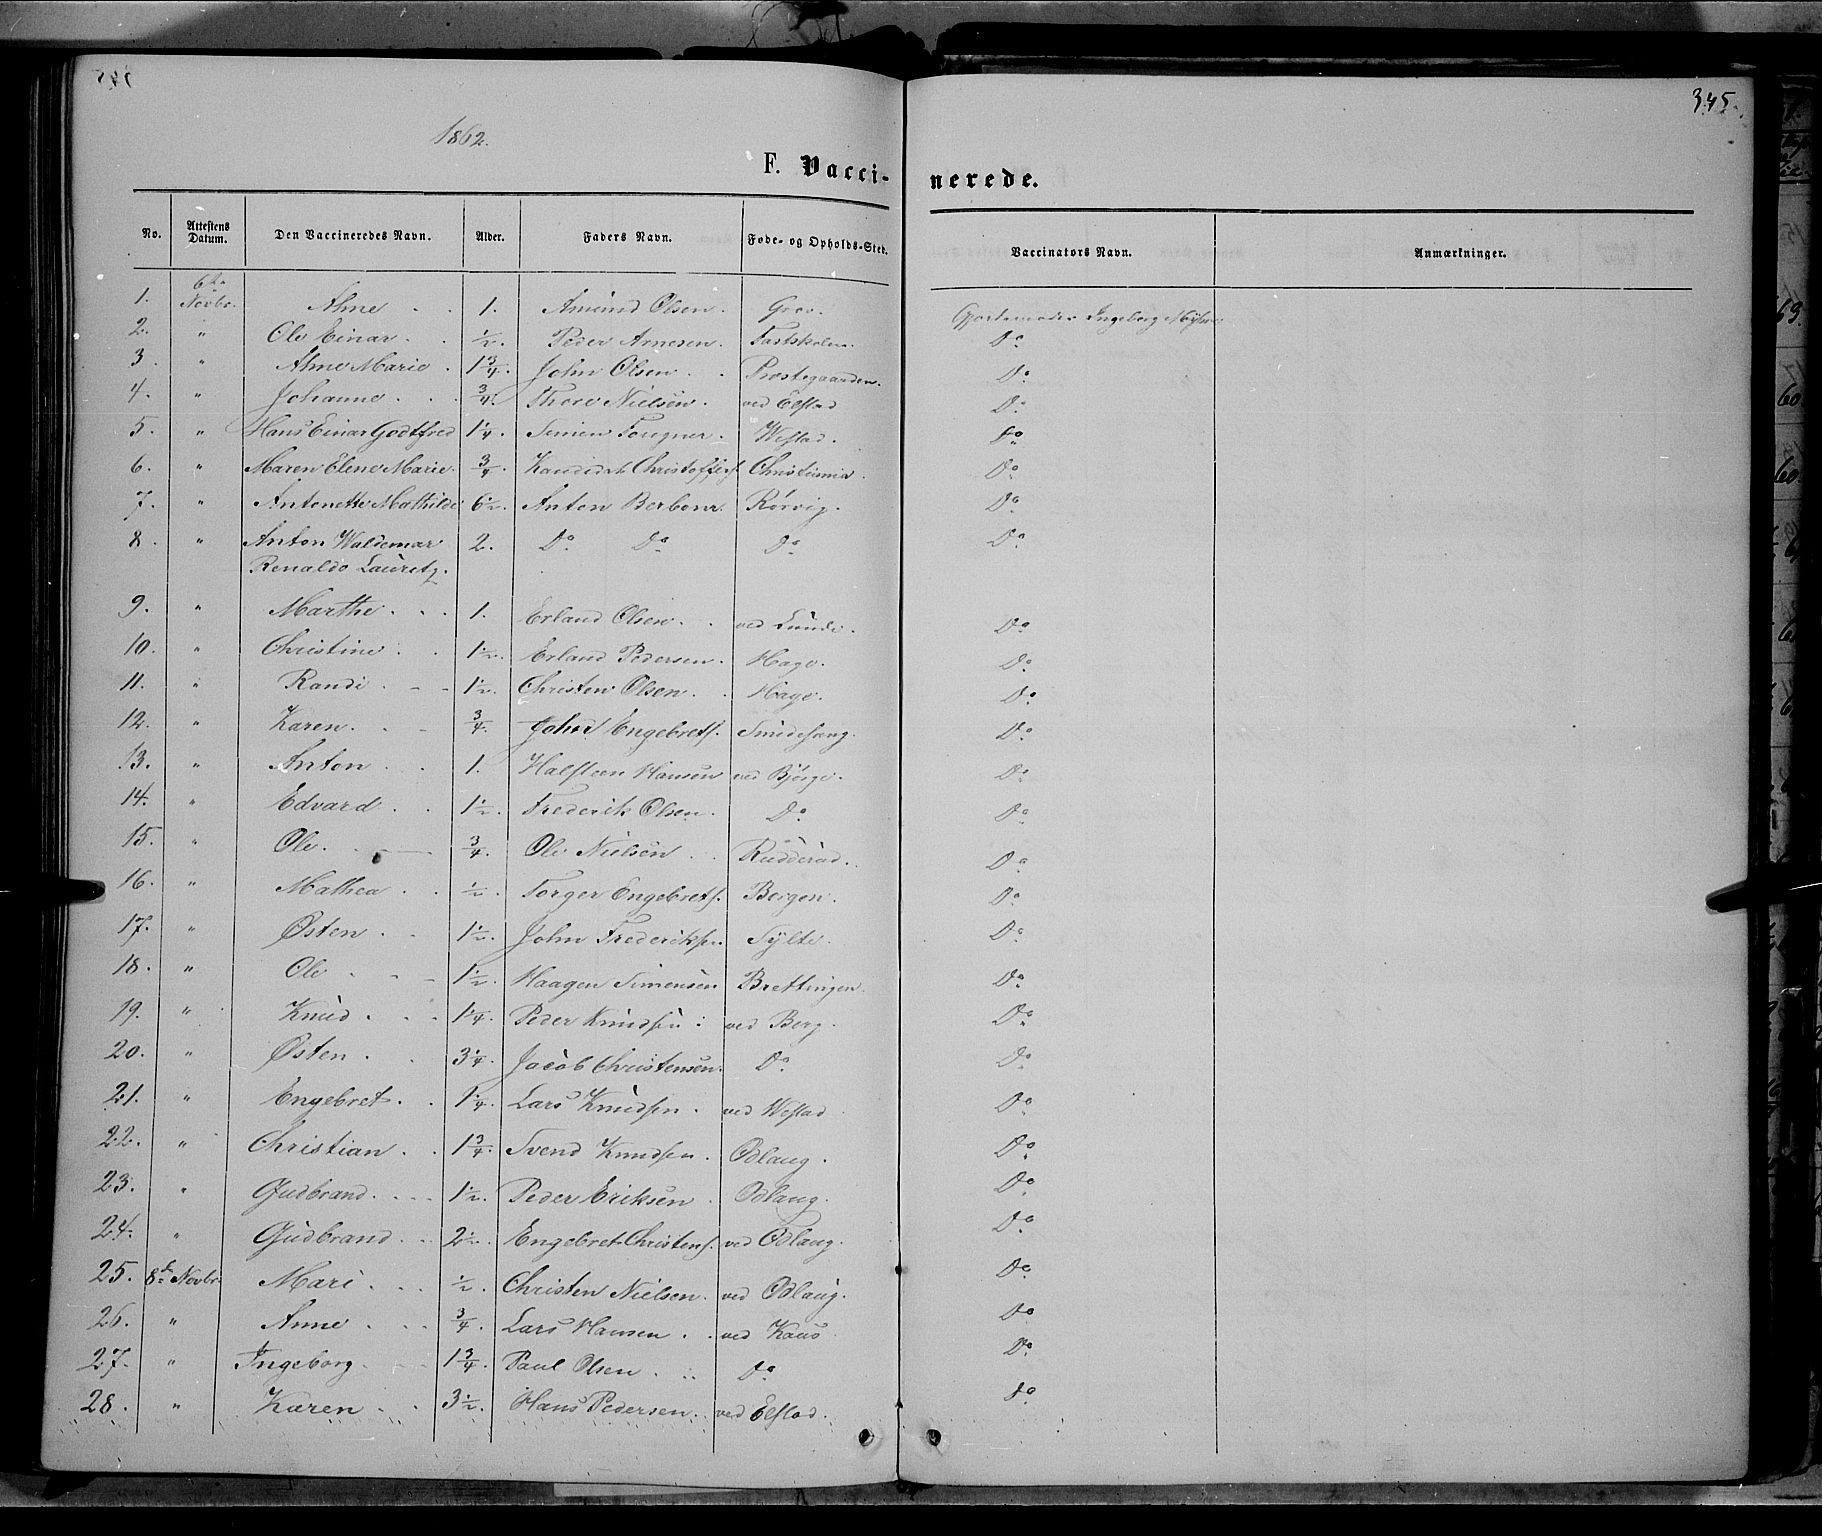 SAH, Ringebu prestekontor, Ministerialbok nr. 7, 1860-1877, s. 345